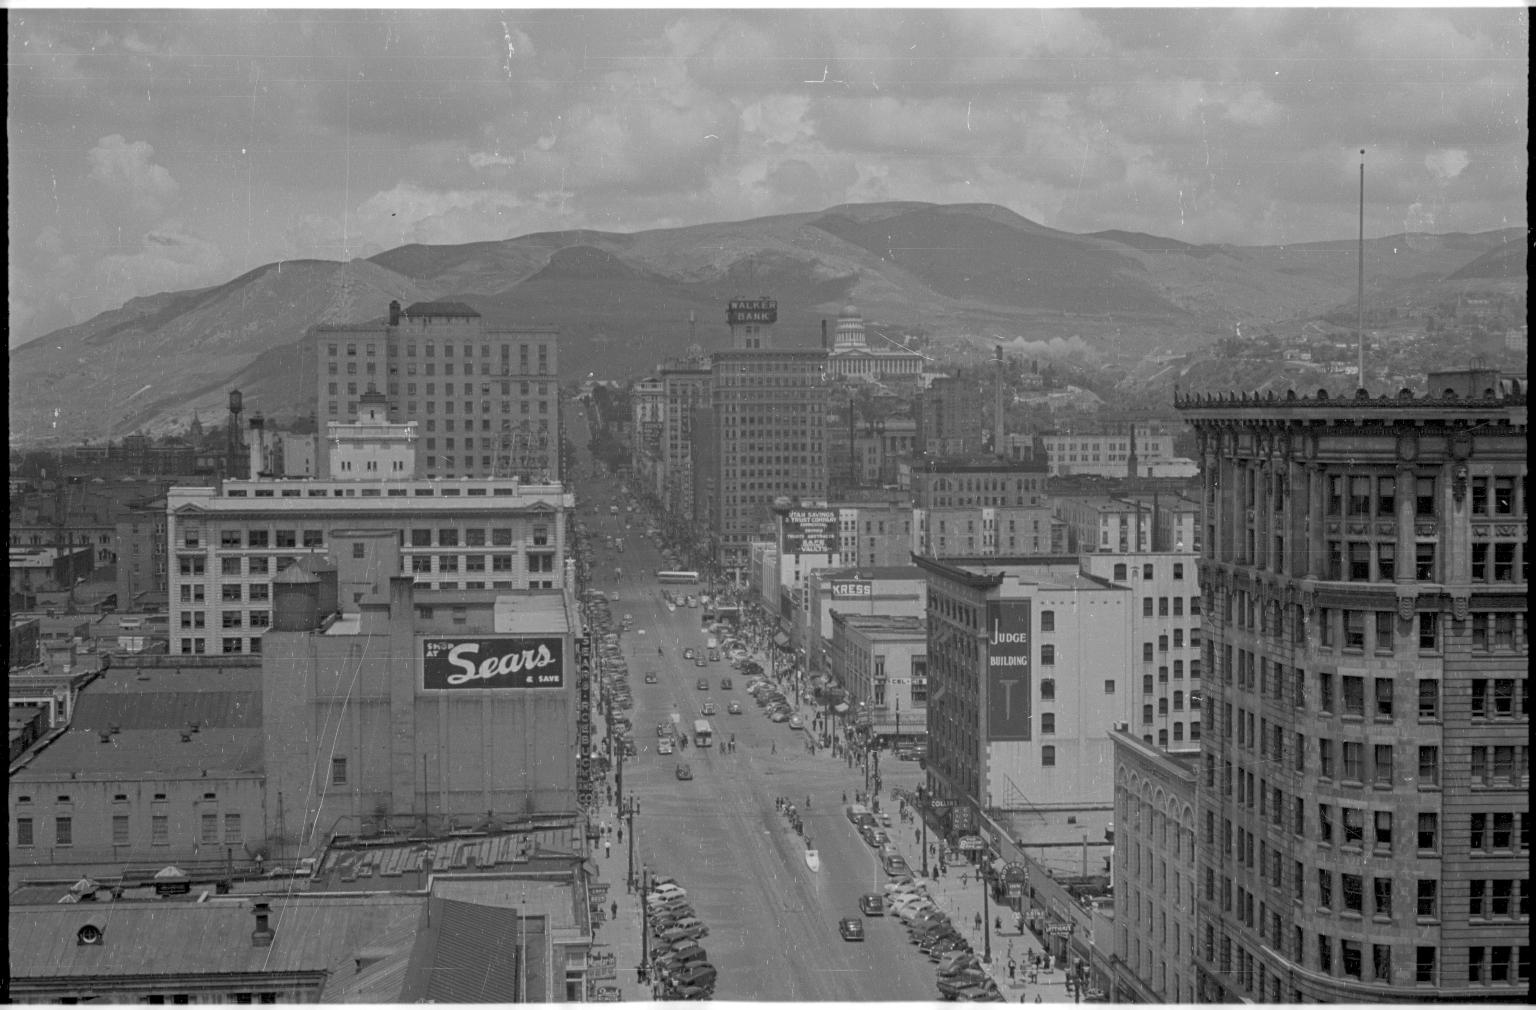 Skyline of Salt Lake City, Utah